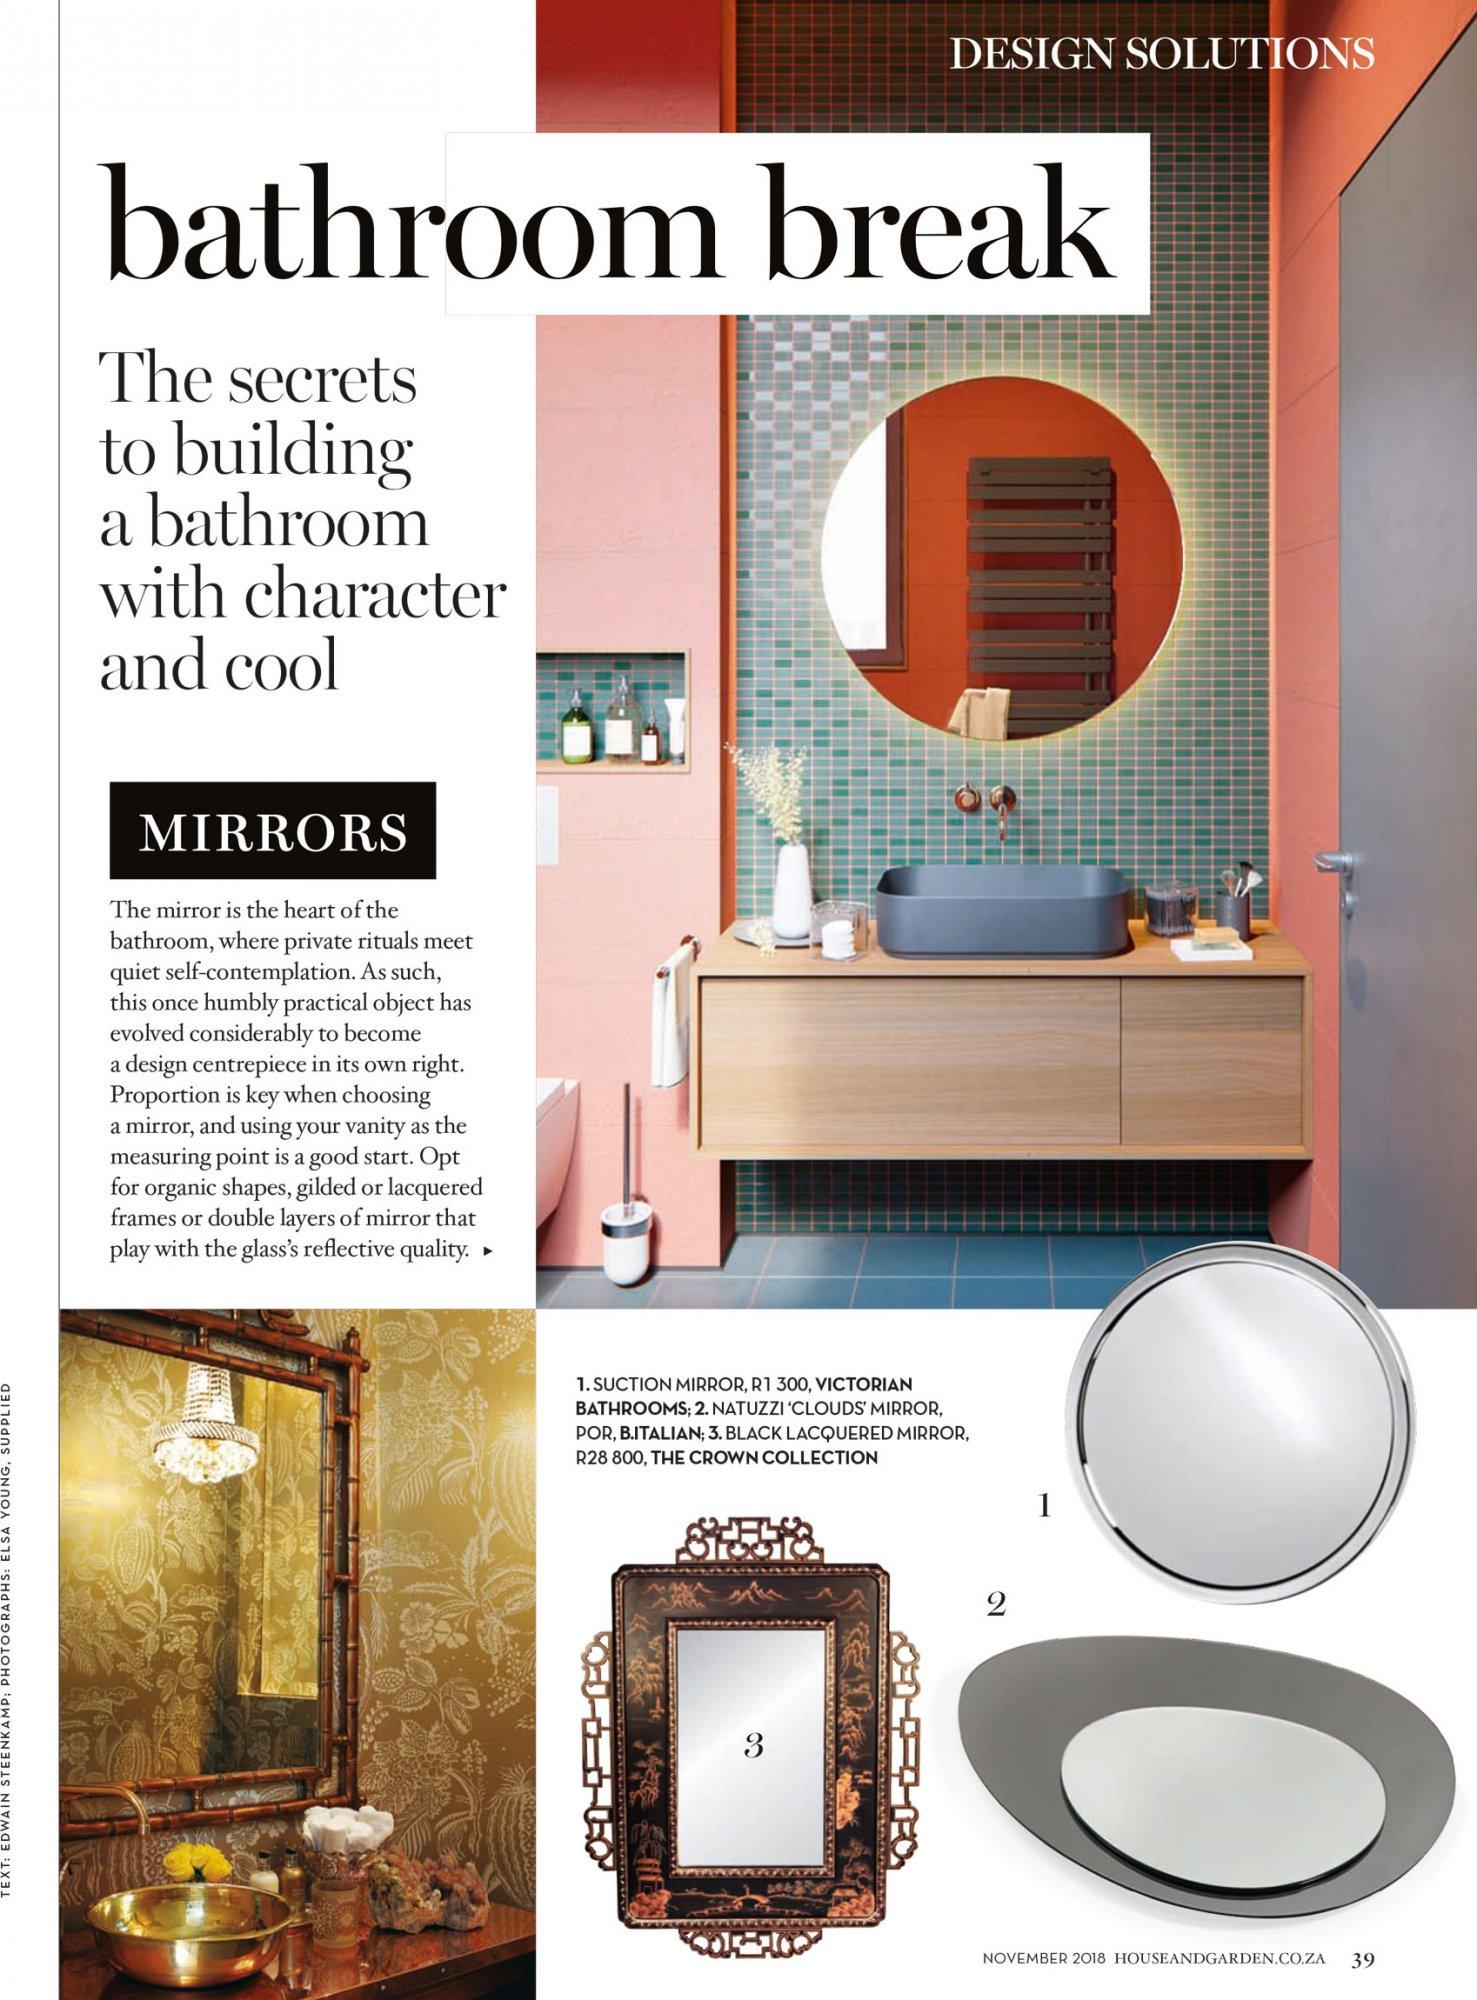 H&G Nov 18 DesignSolutions Bathrooms 1